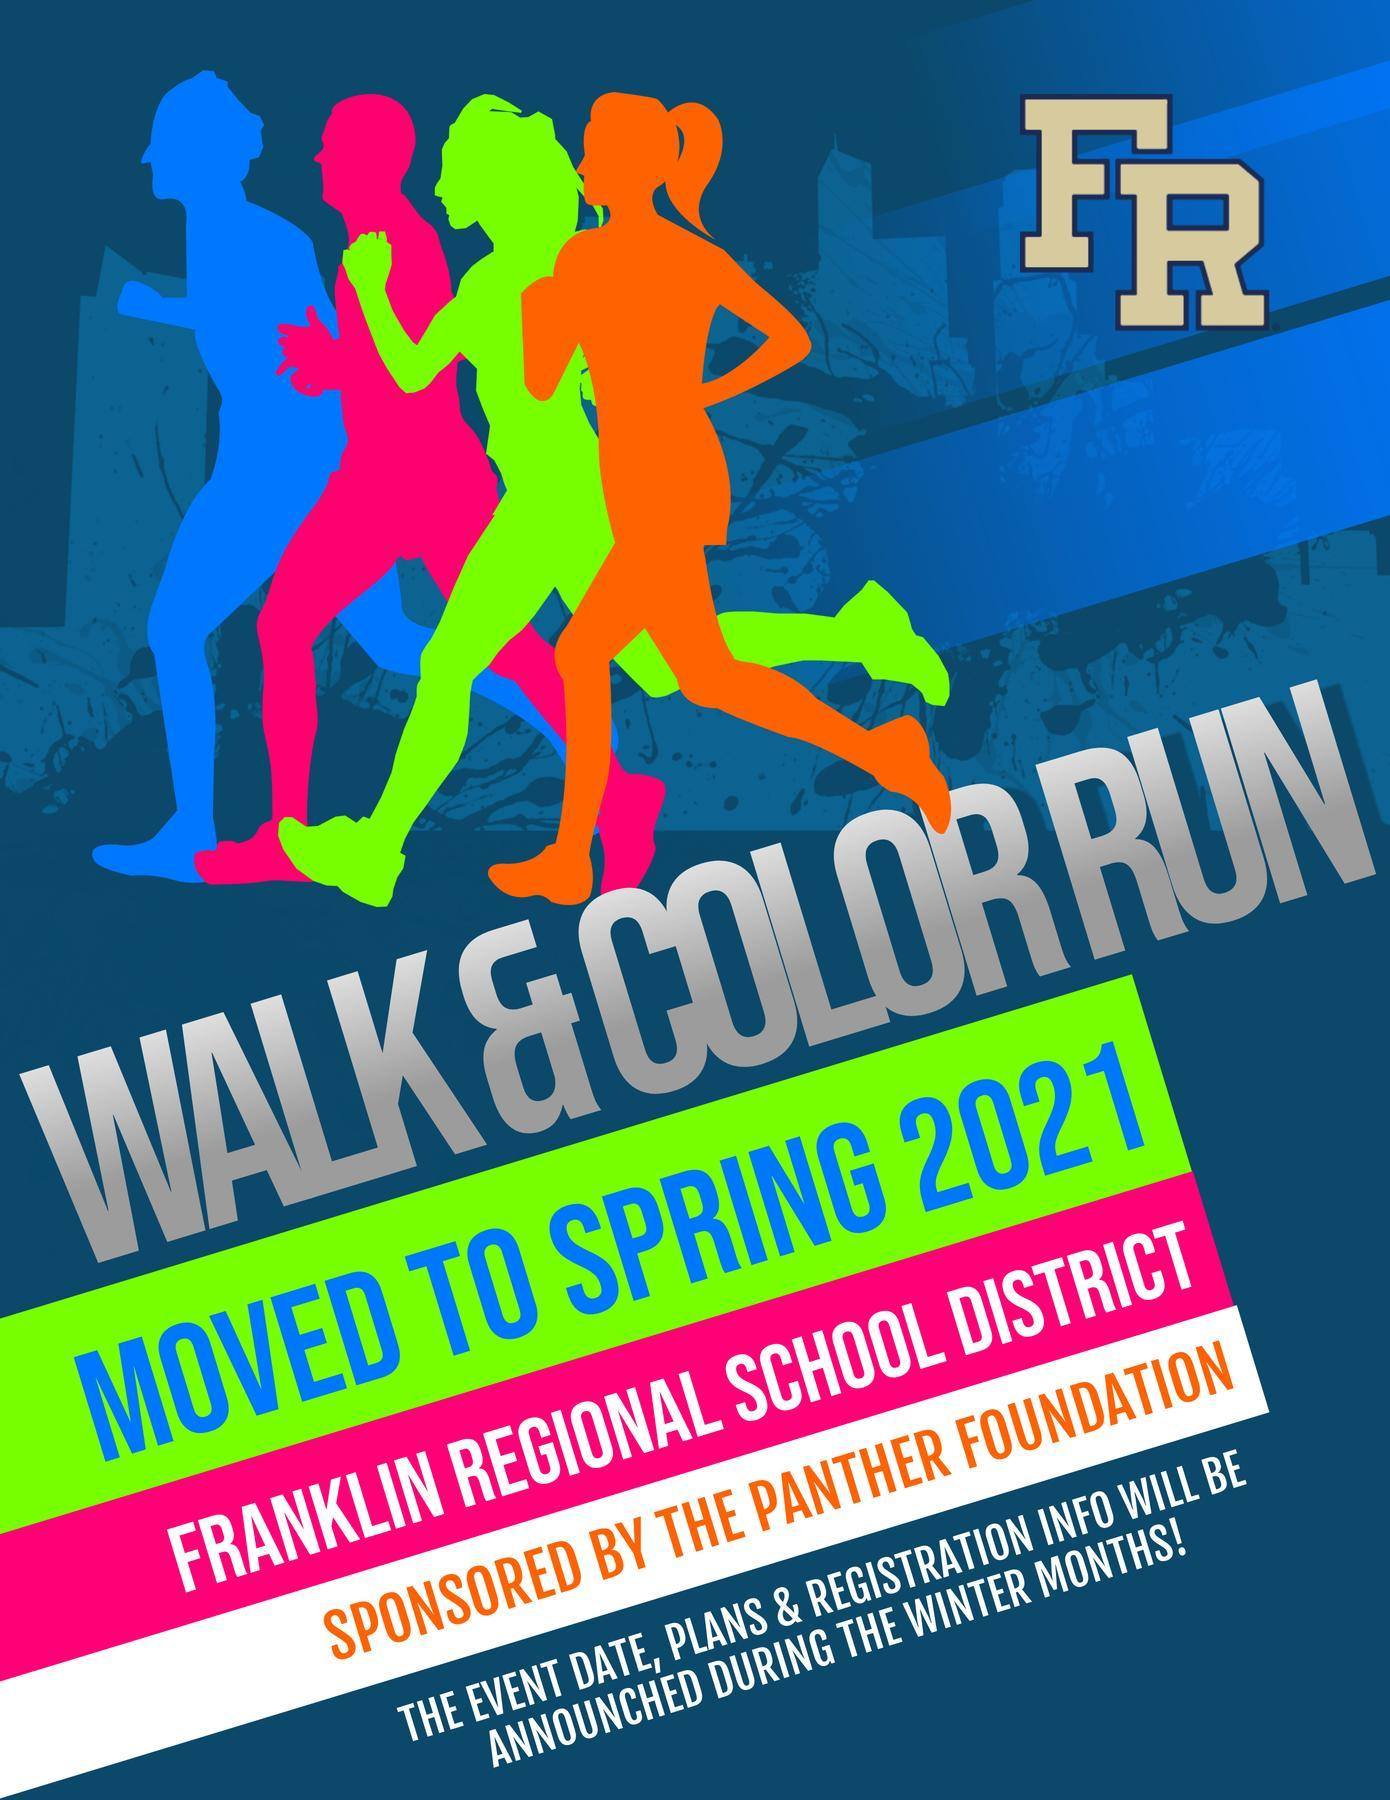 Walk & Color Run Spring 2021